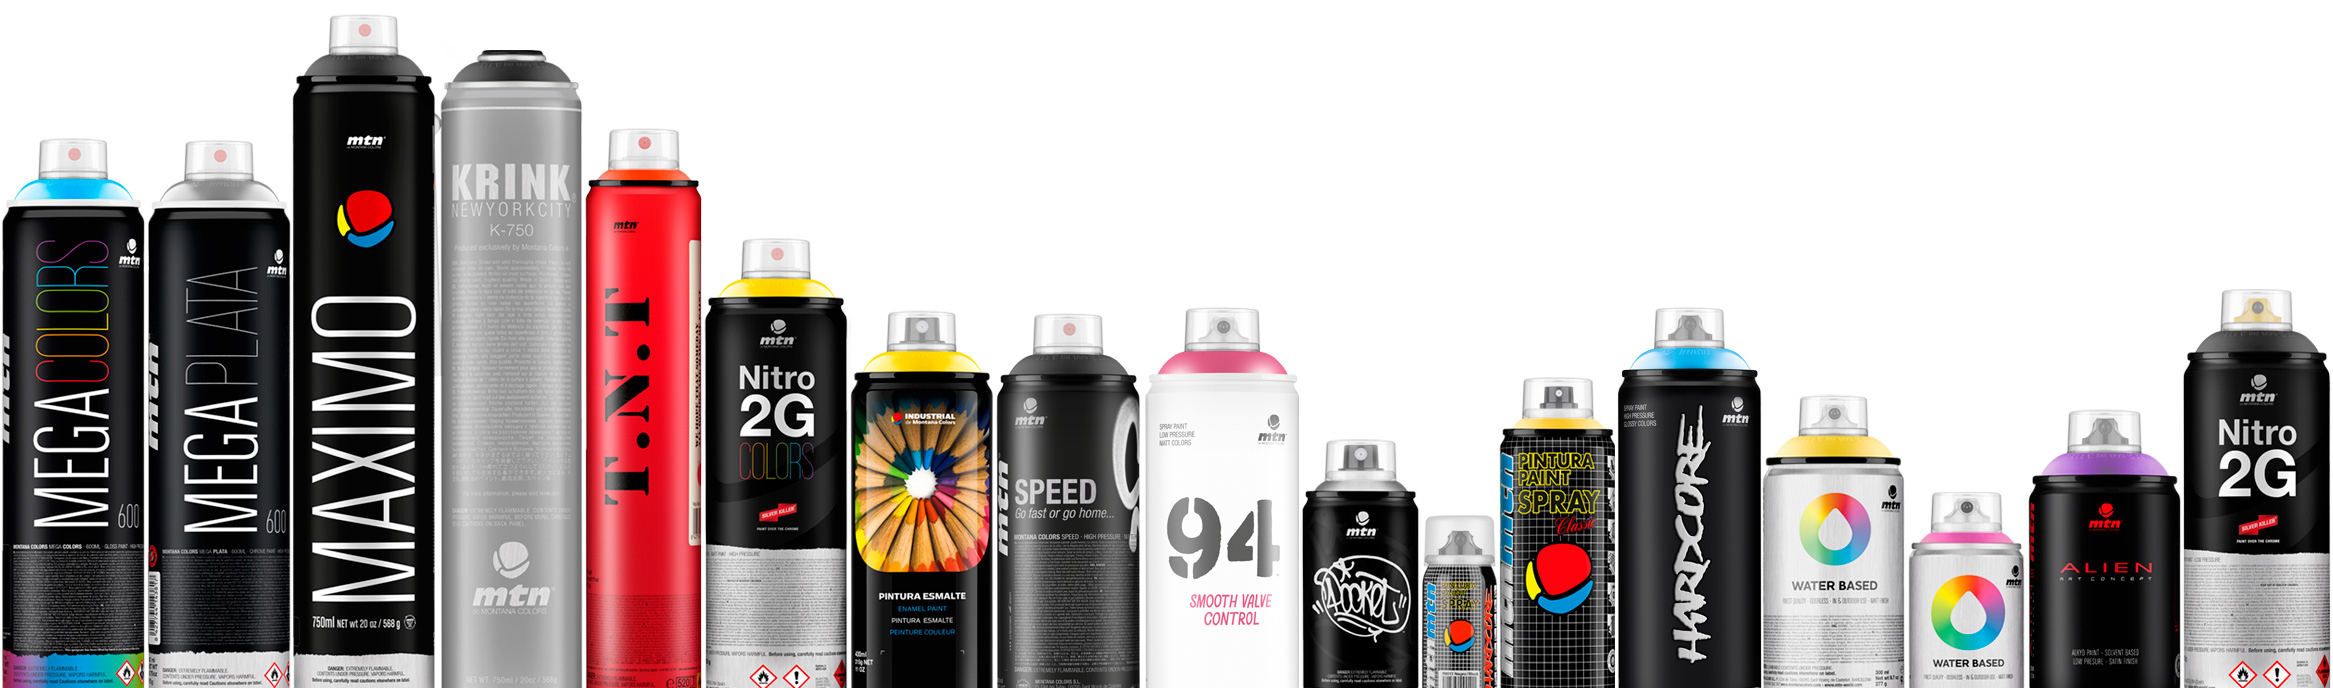 Montana sprays